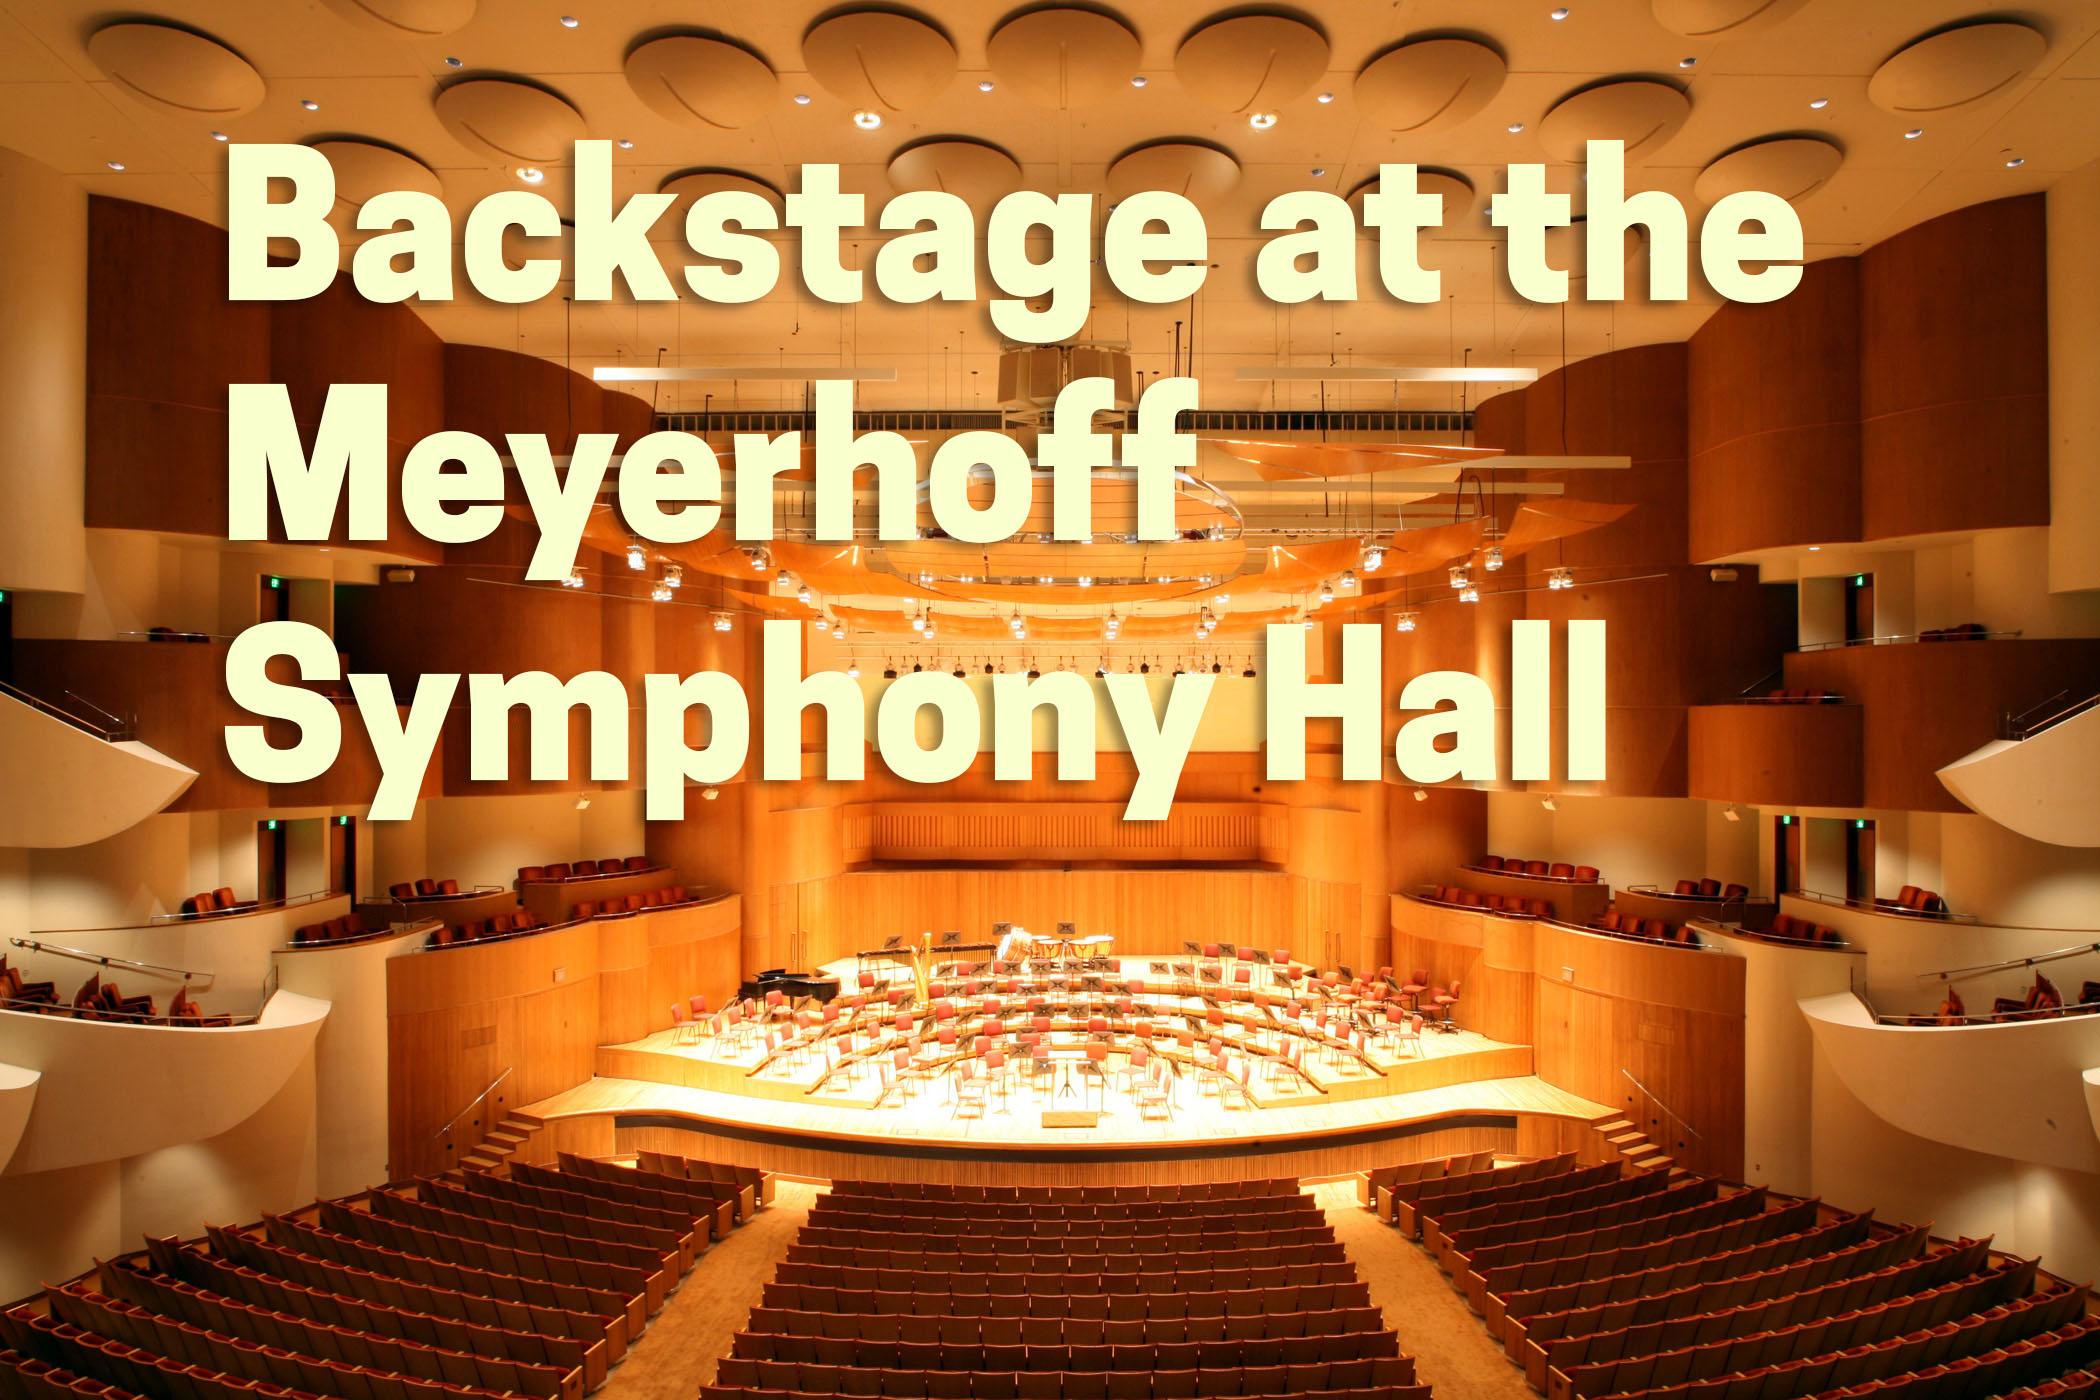 Interior view of the Meyerhoff Symphony Hall.